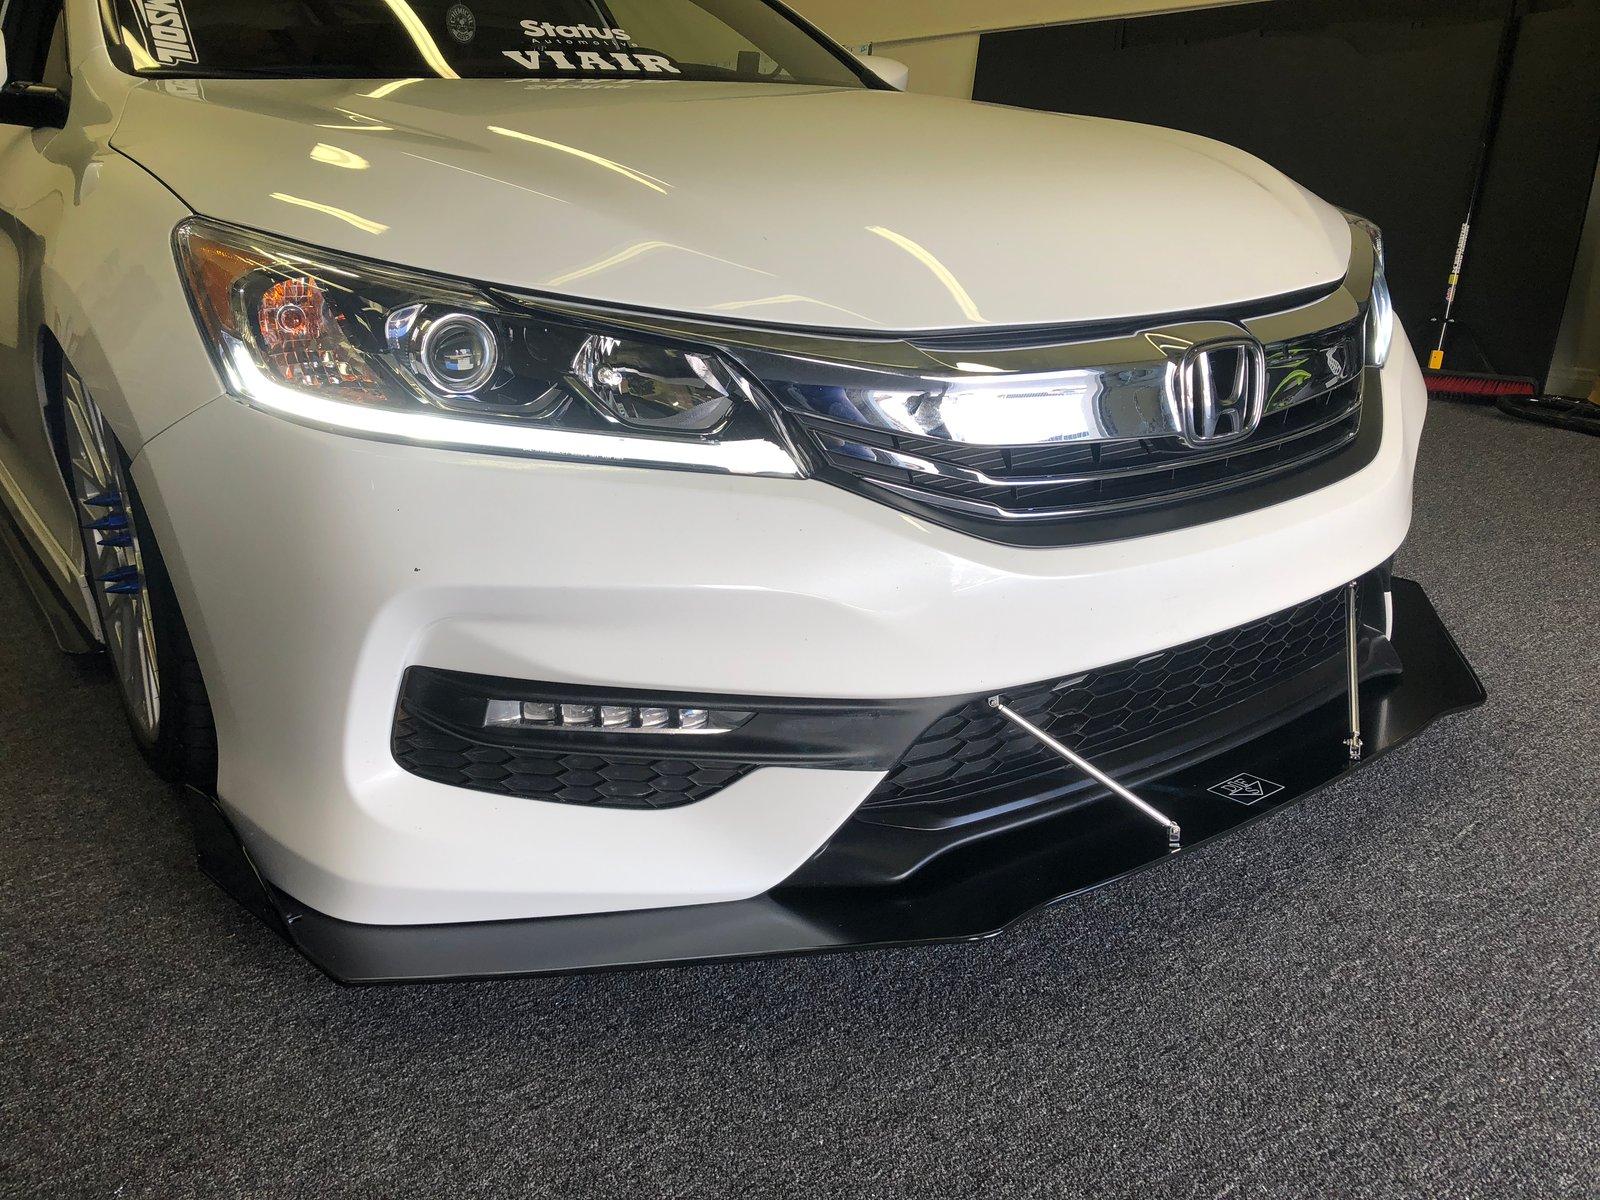 Downforcesolutions 9th Gen Honda Accord V2 Front Splitter